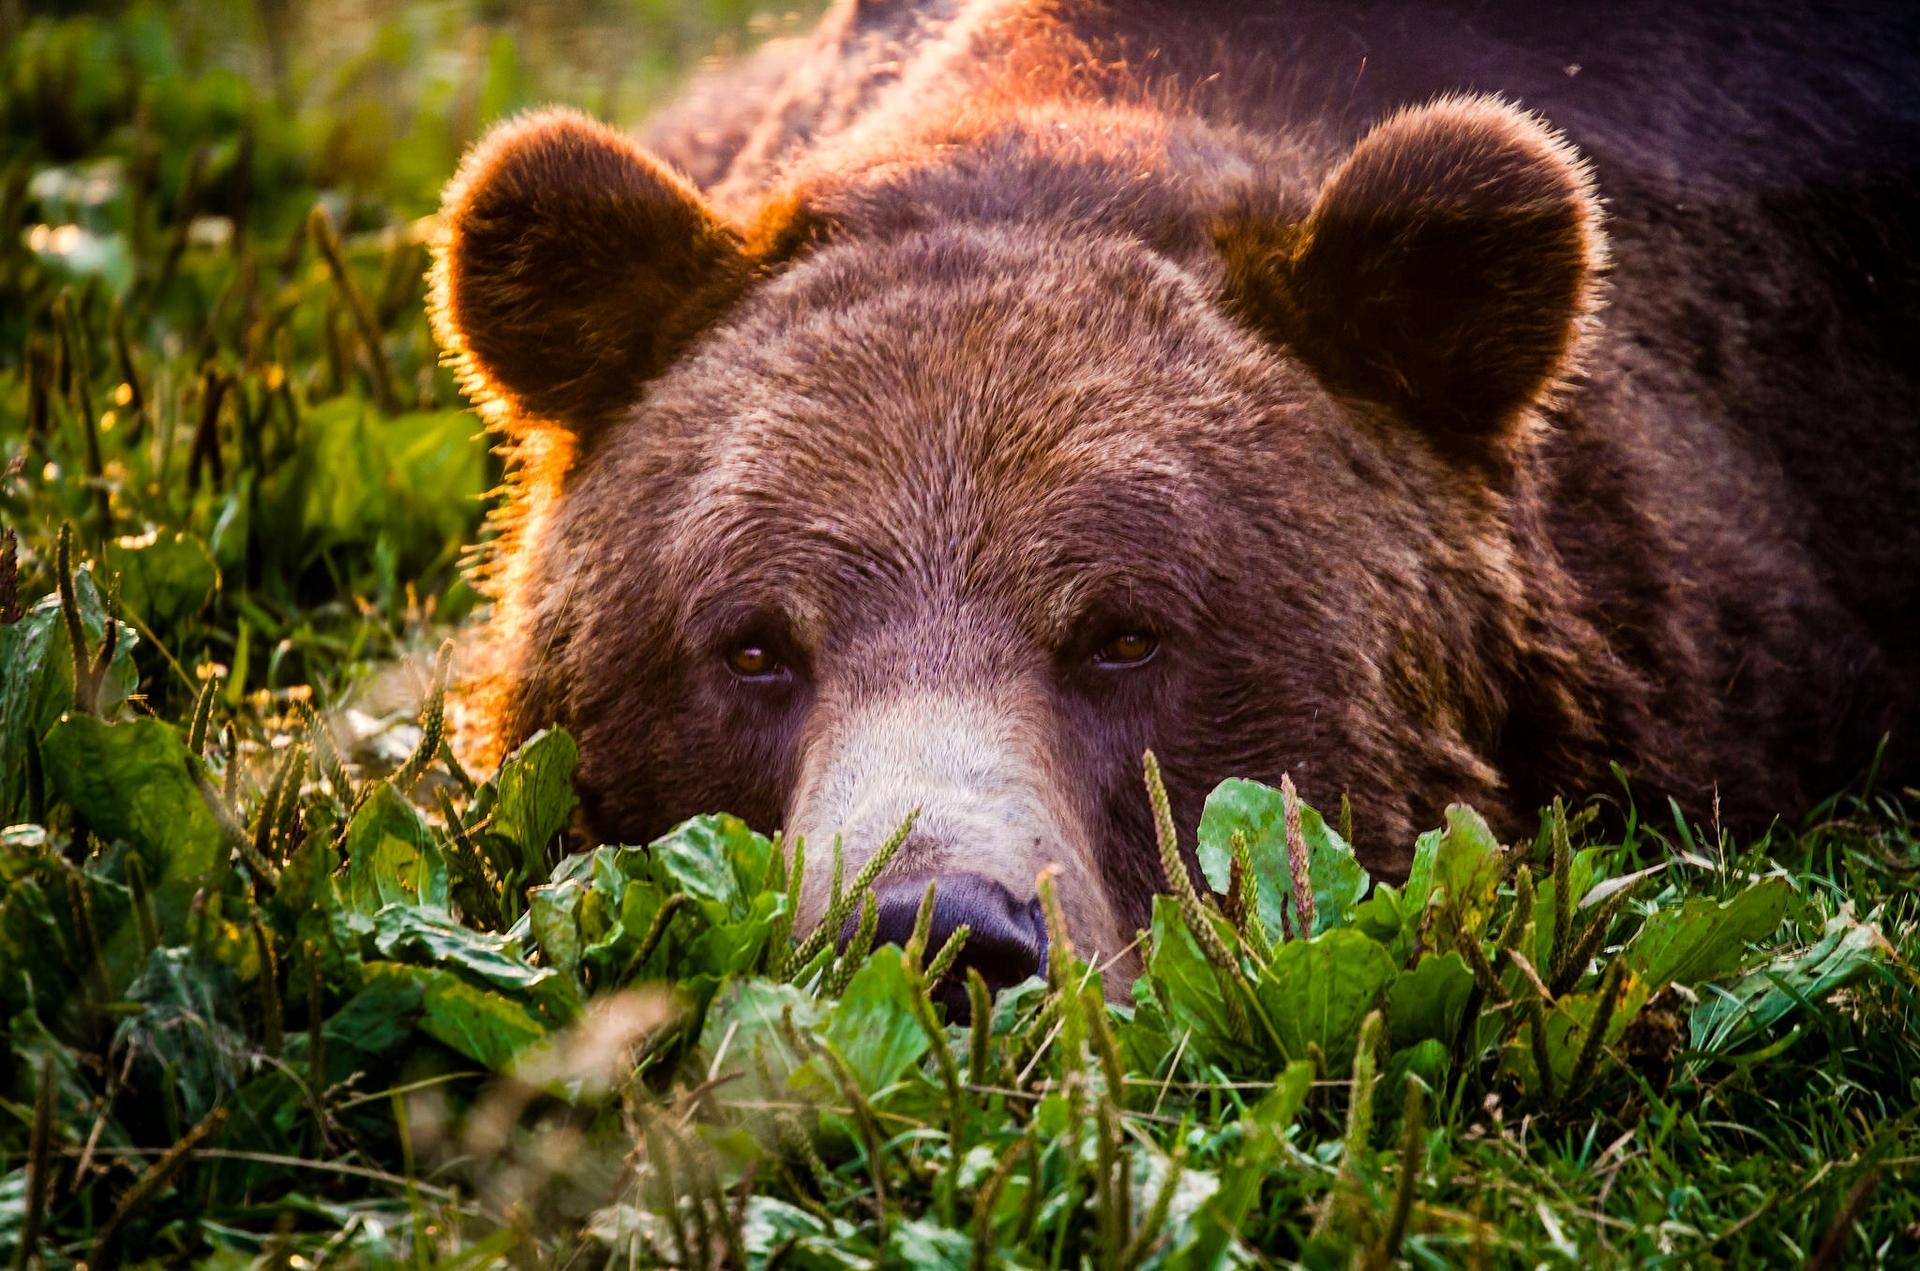 Sfondi : Viso, Erba, Natura, Barba, Orso Grizzly, Orso